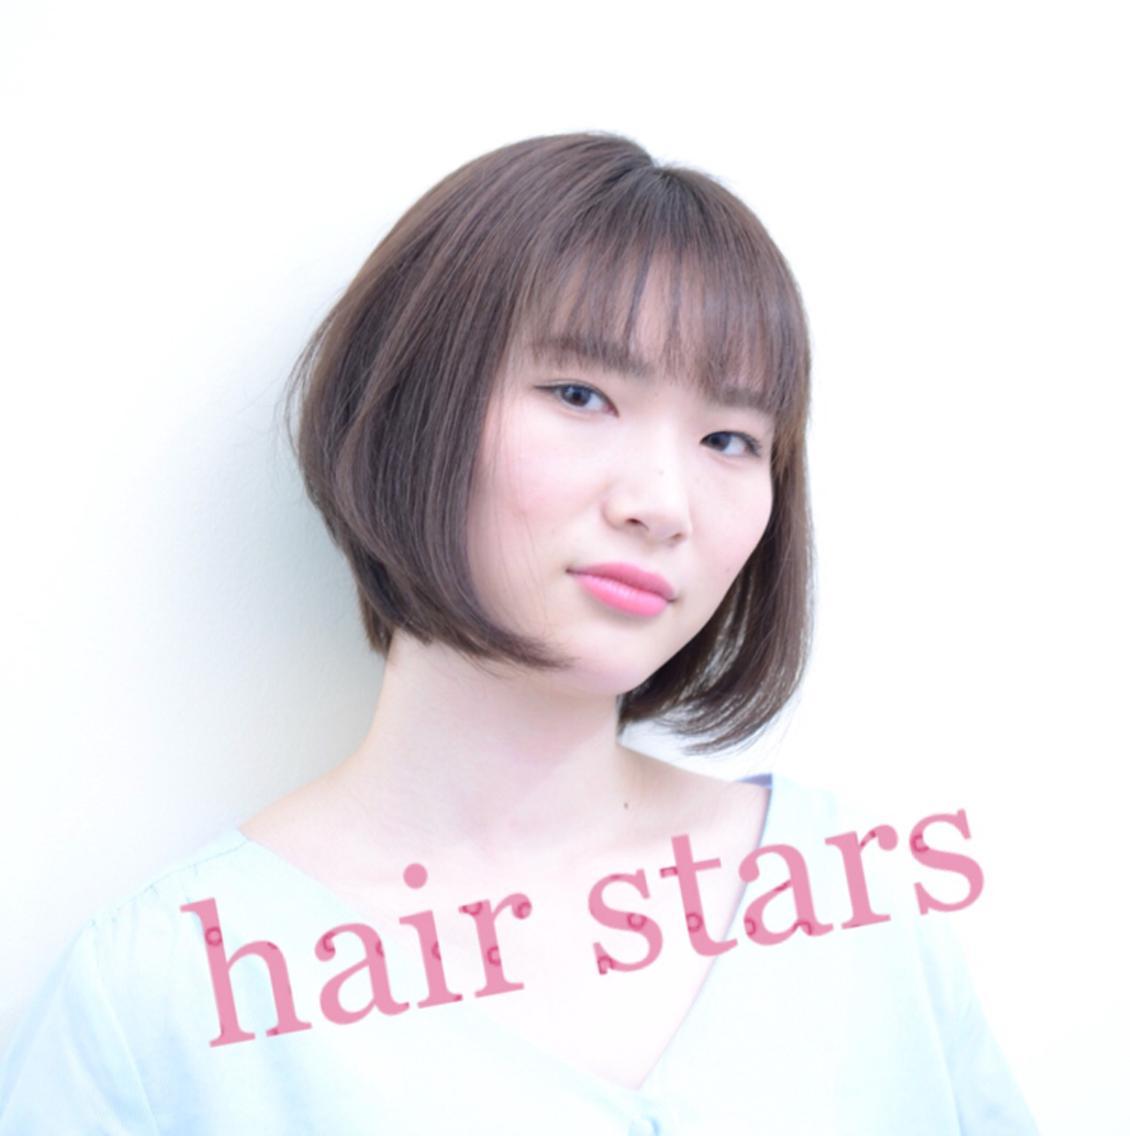 hair stars所属・小泉光司の掲載